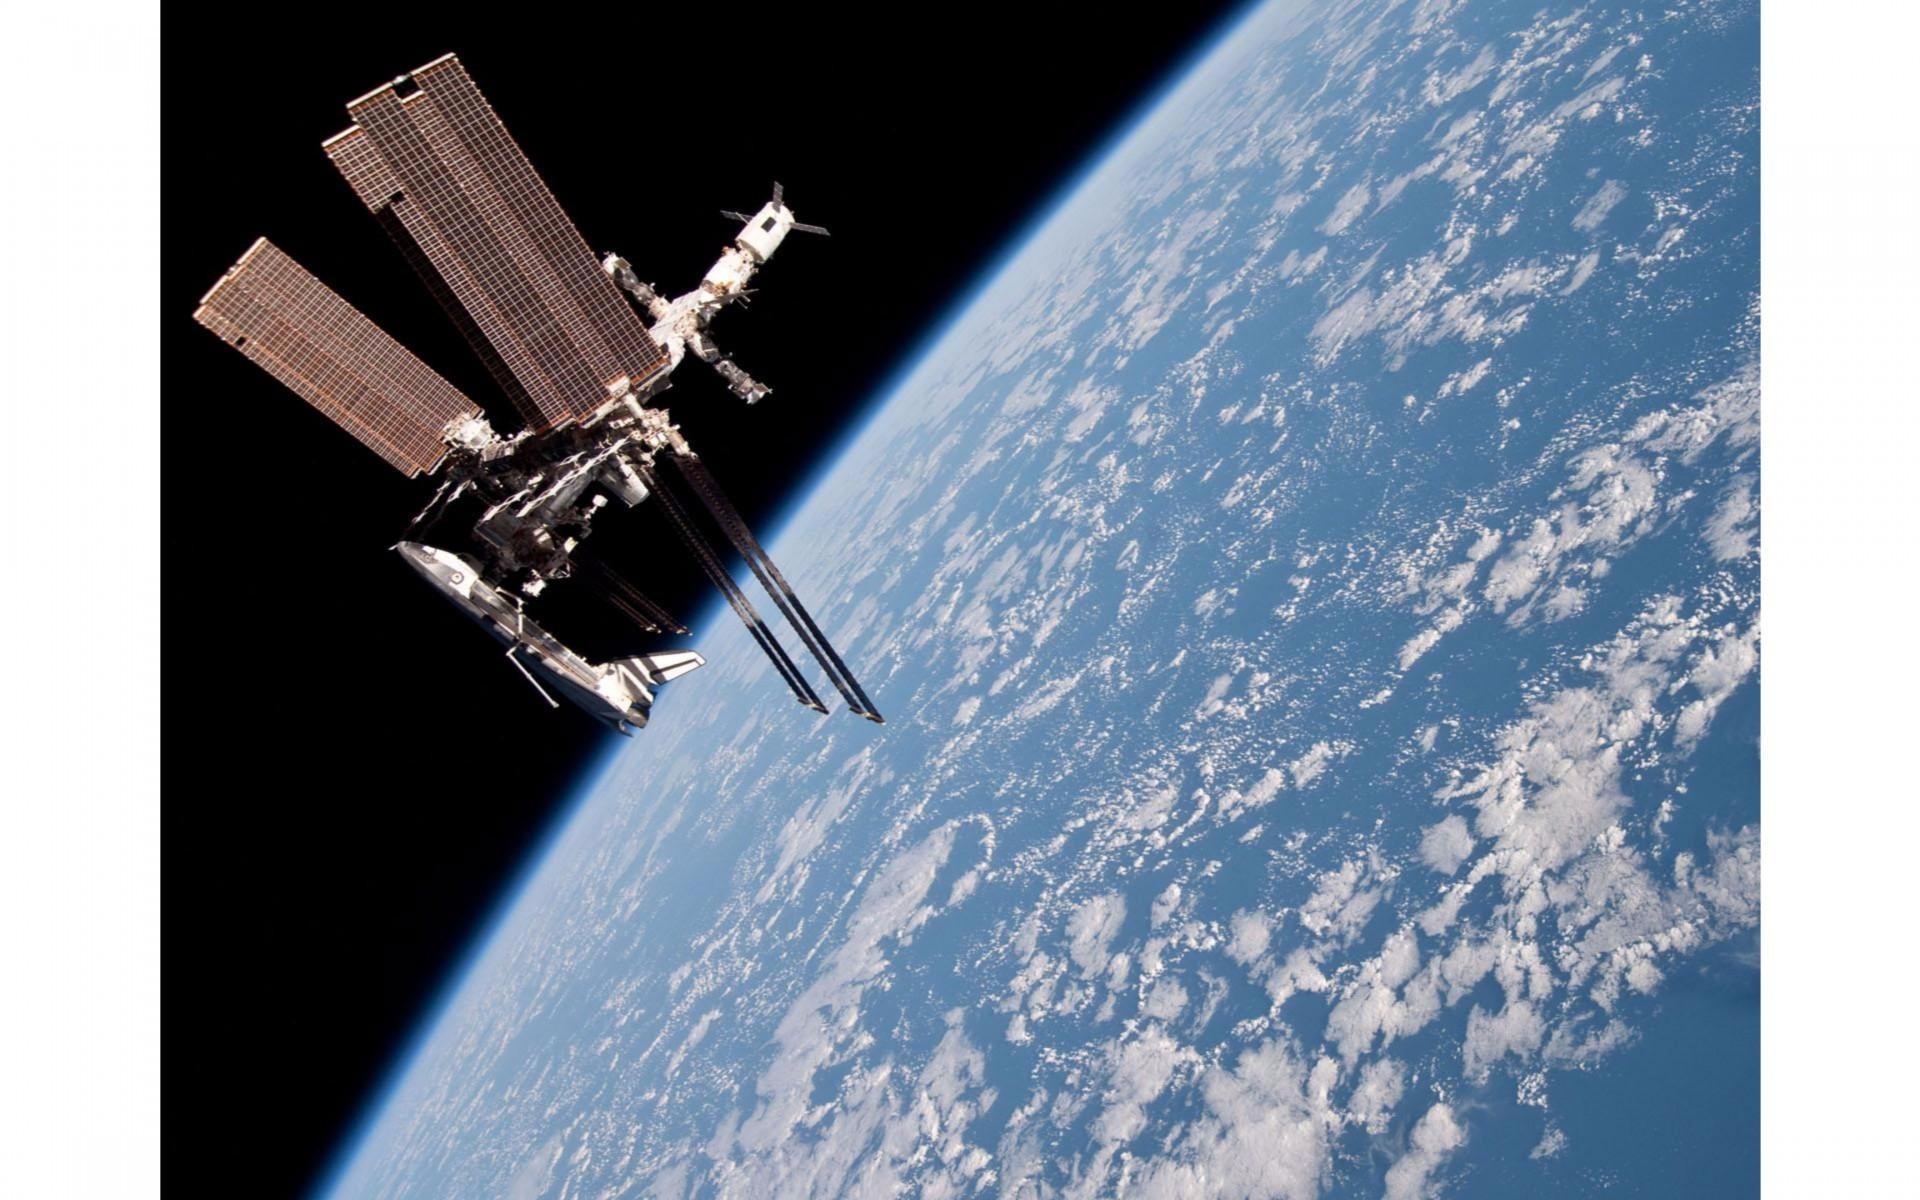 International Space Station in Space 4K Wallpaper